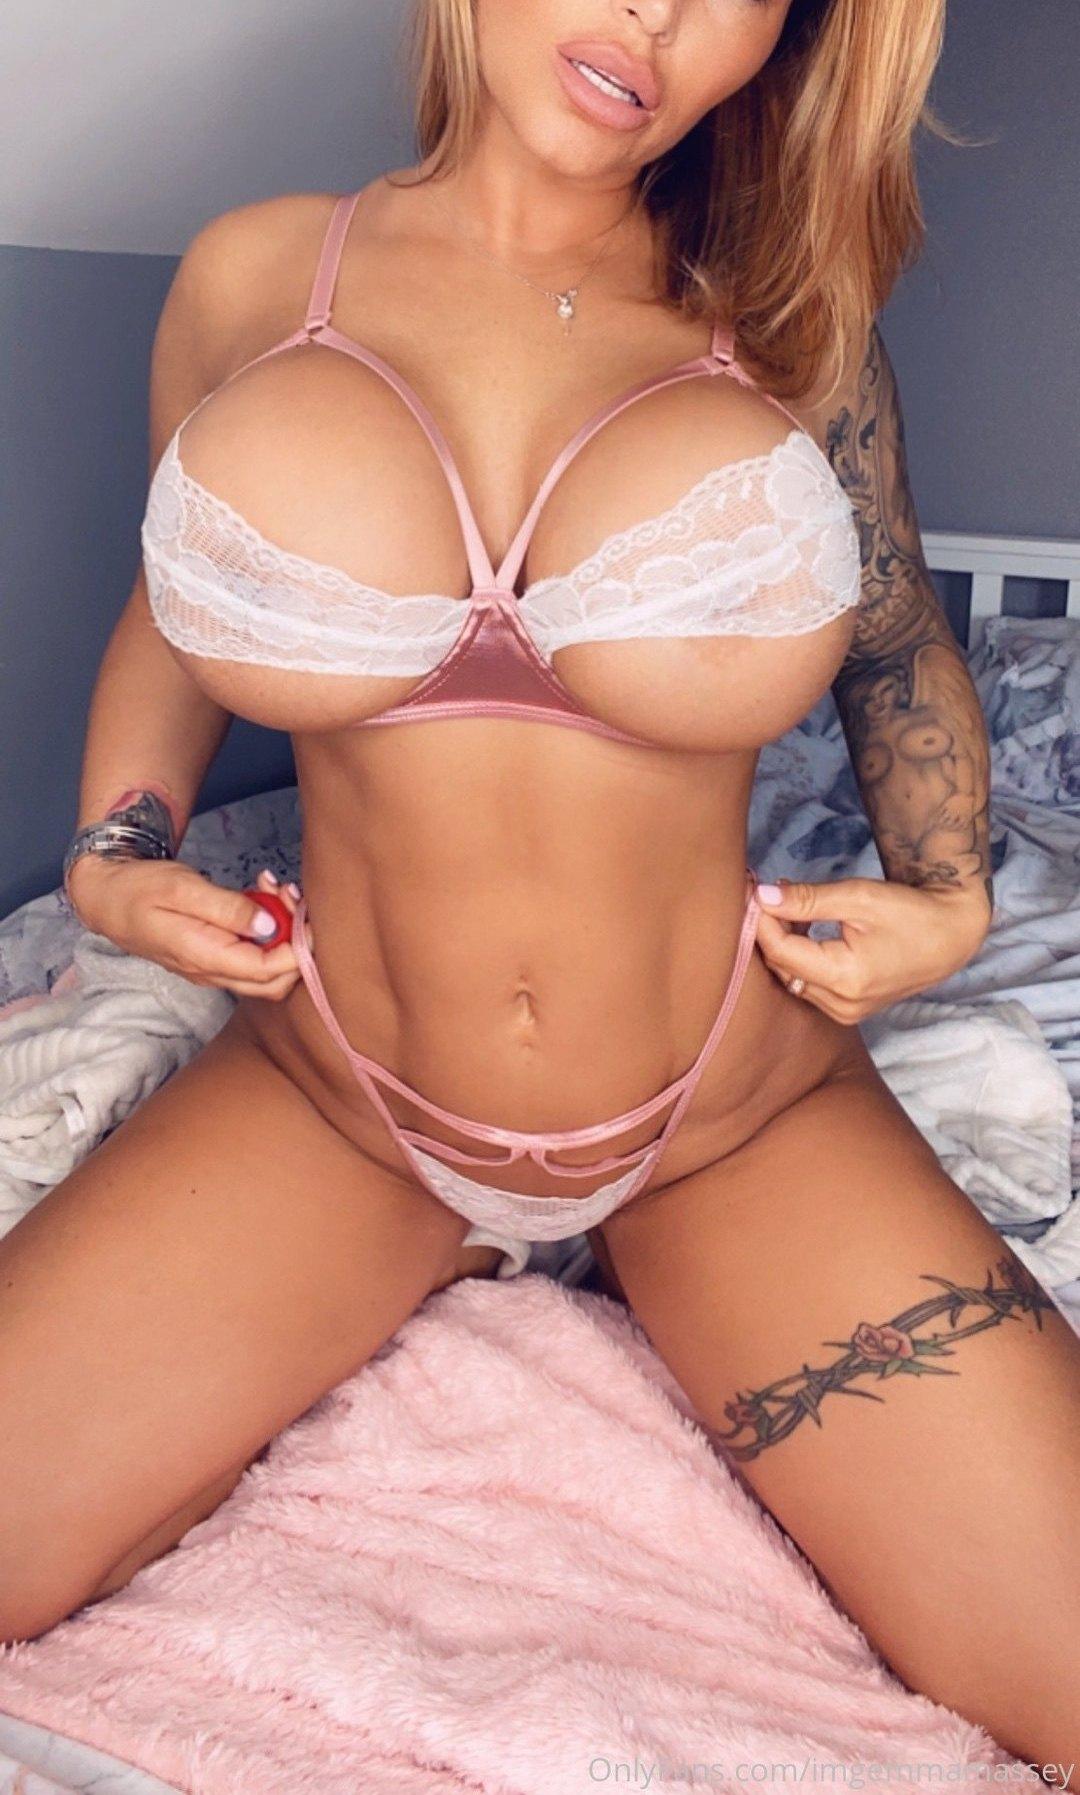 Gemma Massey Imgemmamassey Onlyfans Nudes Leaks 0025